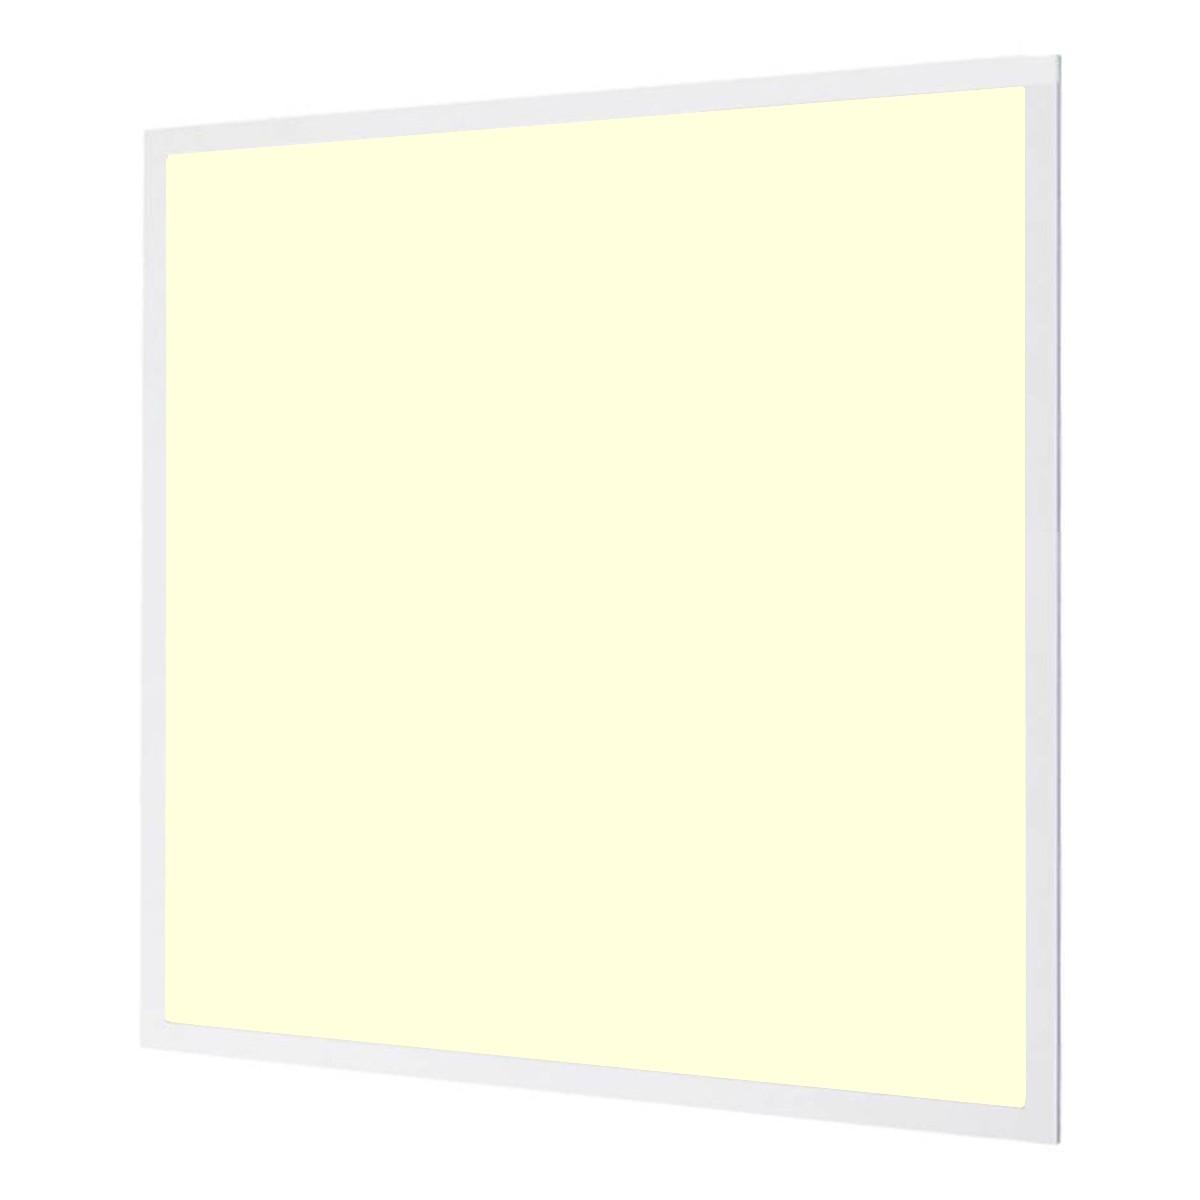 LED Paneel - Aigi - 60x60 Warm Wit 3000K - 40W High Lumen UGR19 - Inbouw Vierkant - Mat Wit - Flikke